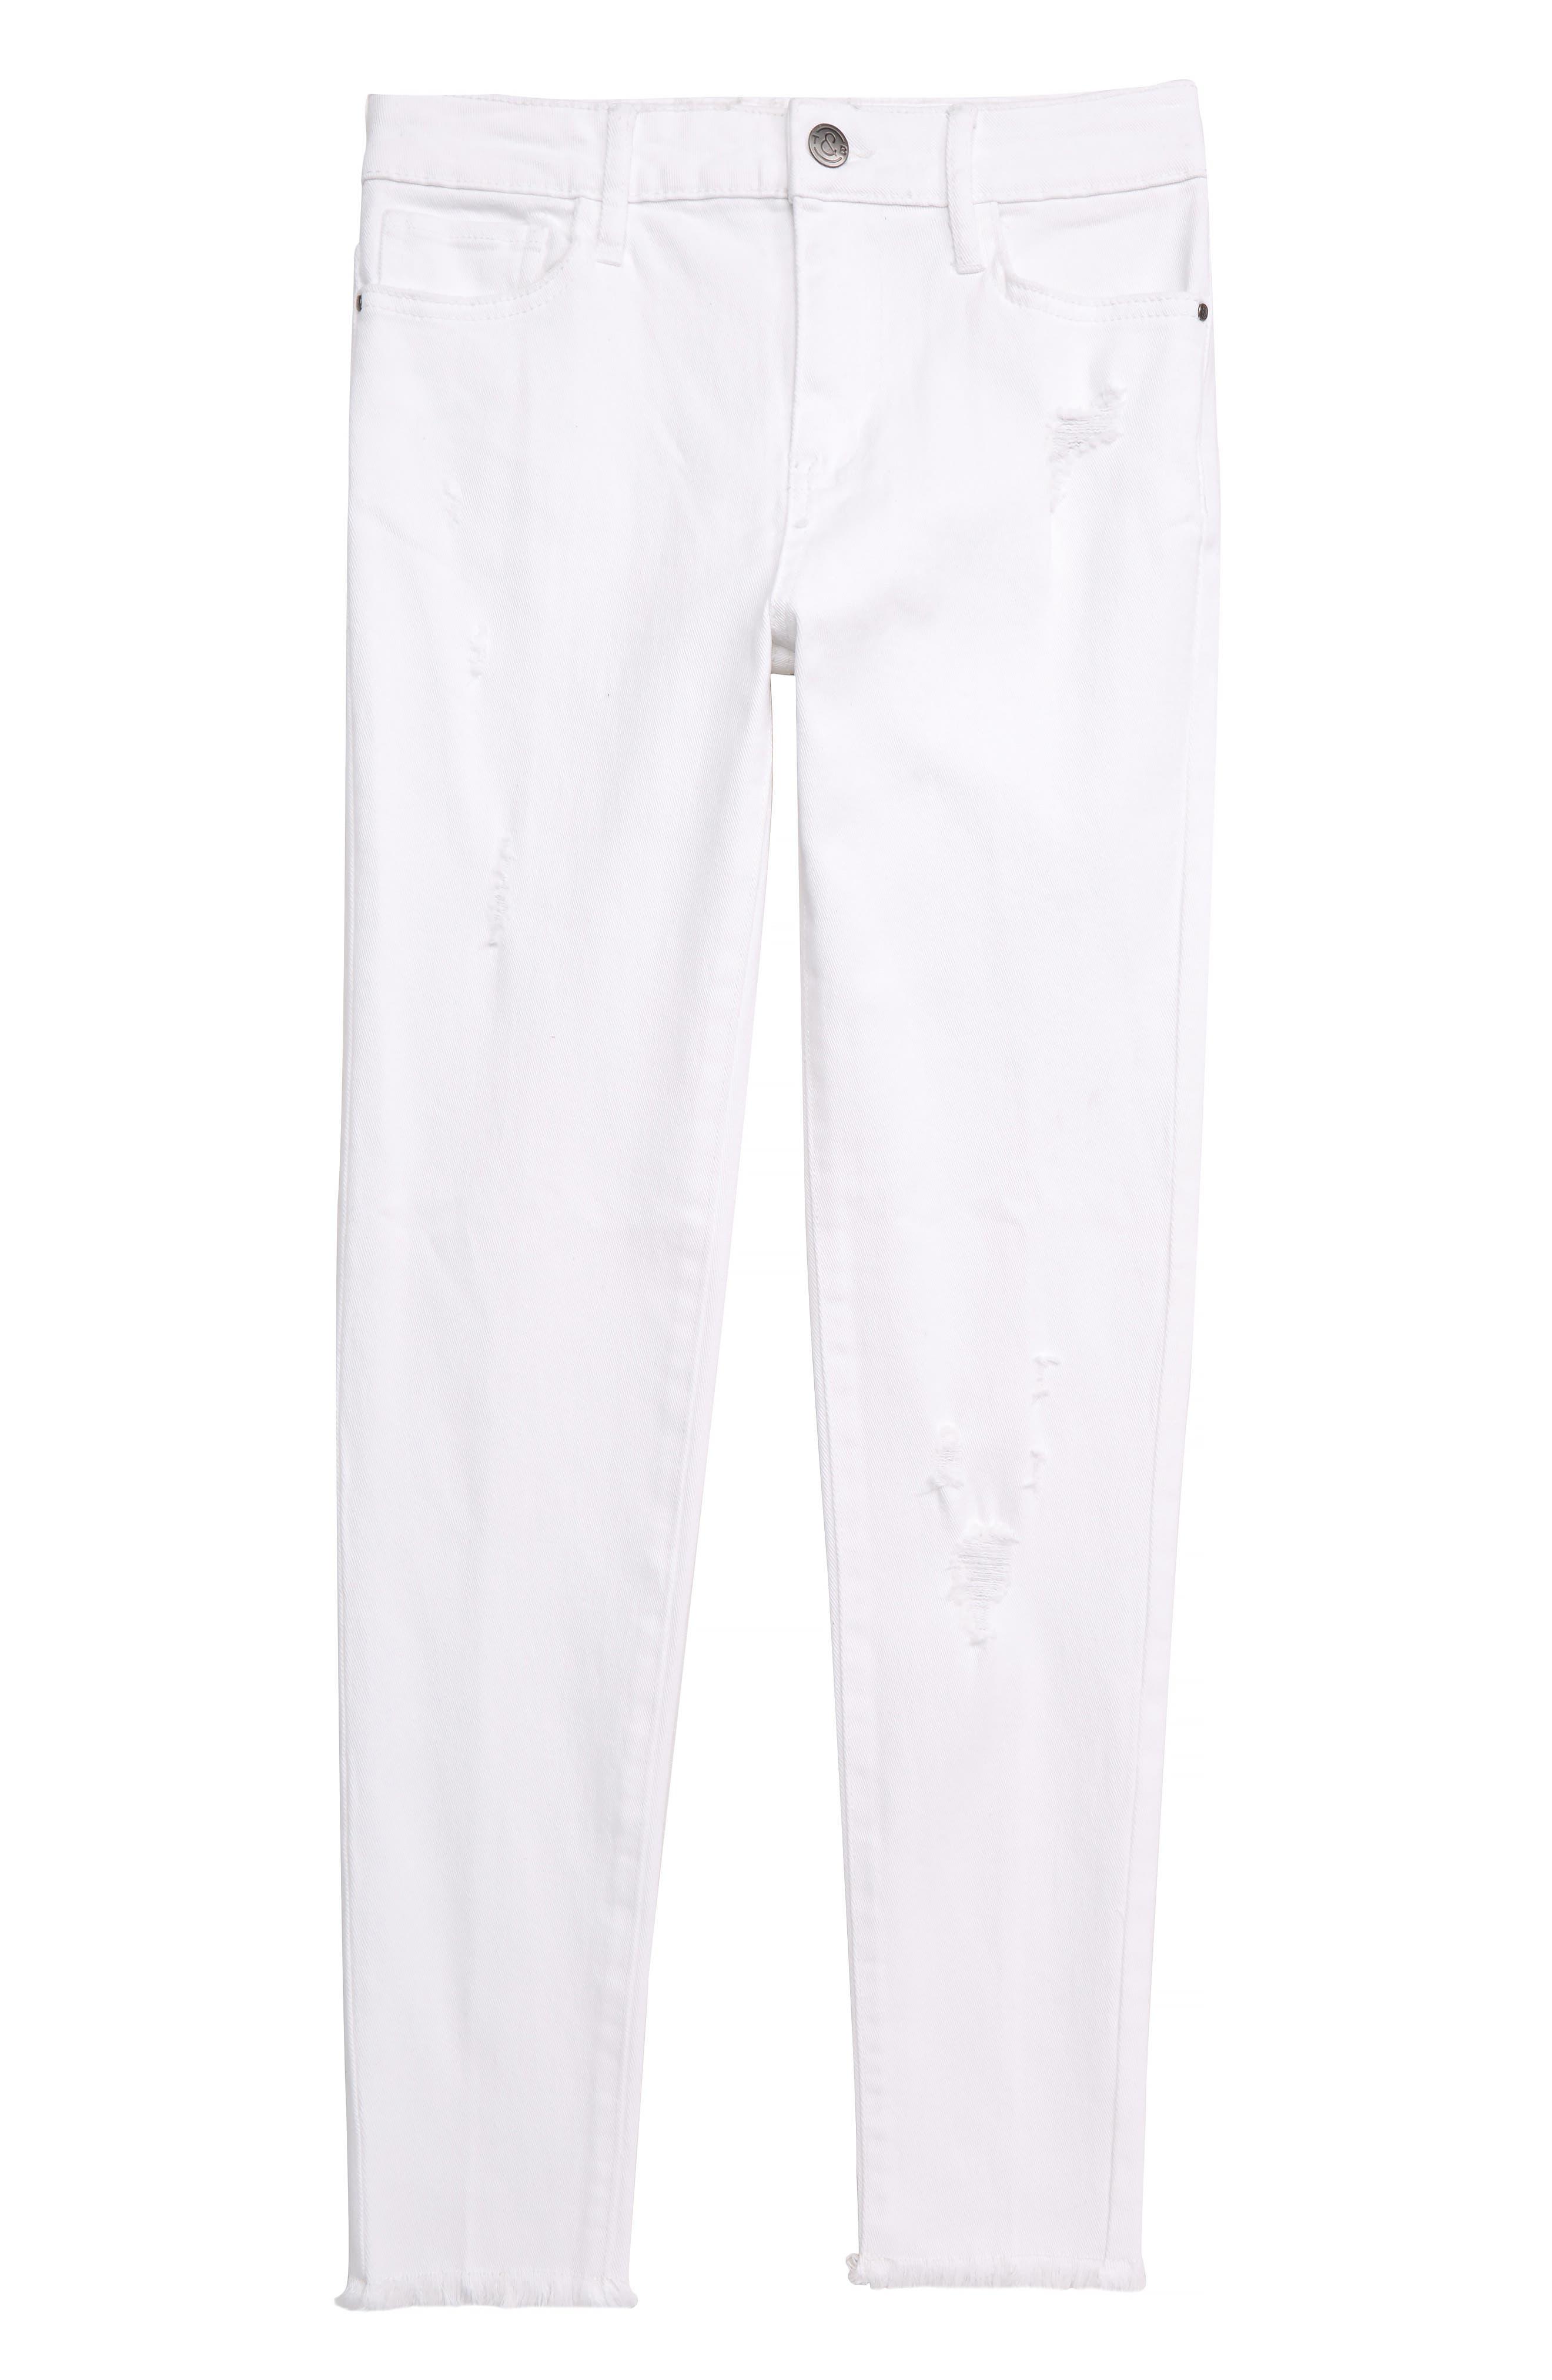 TREASURE & BOND, Distressed Skinny Jeans, Main thumbnail 1, color, WHITE